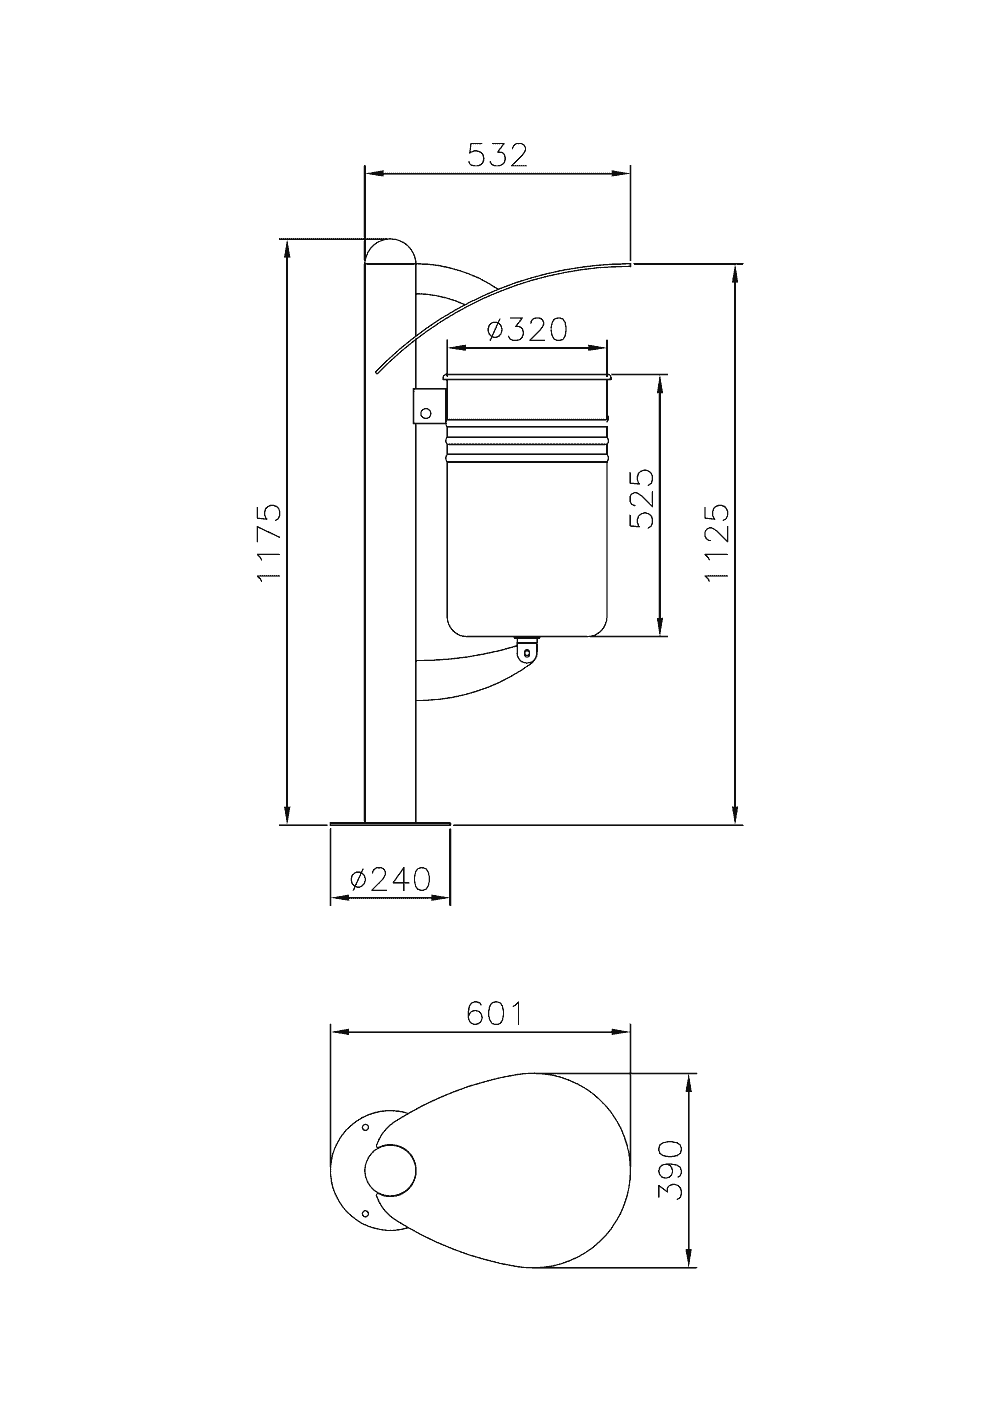 Mülleimer Basket Stahl Skizze